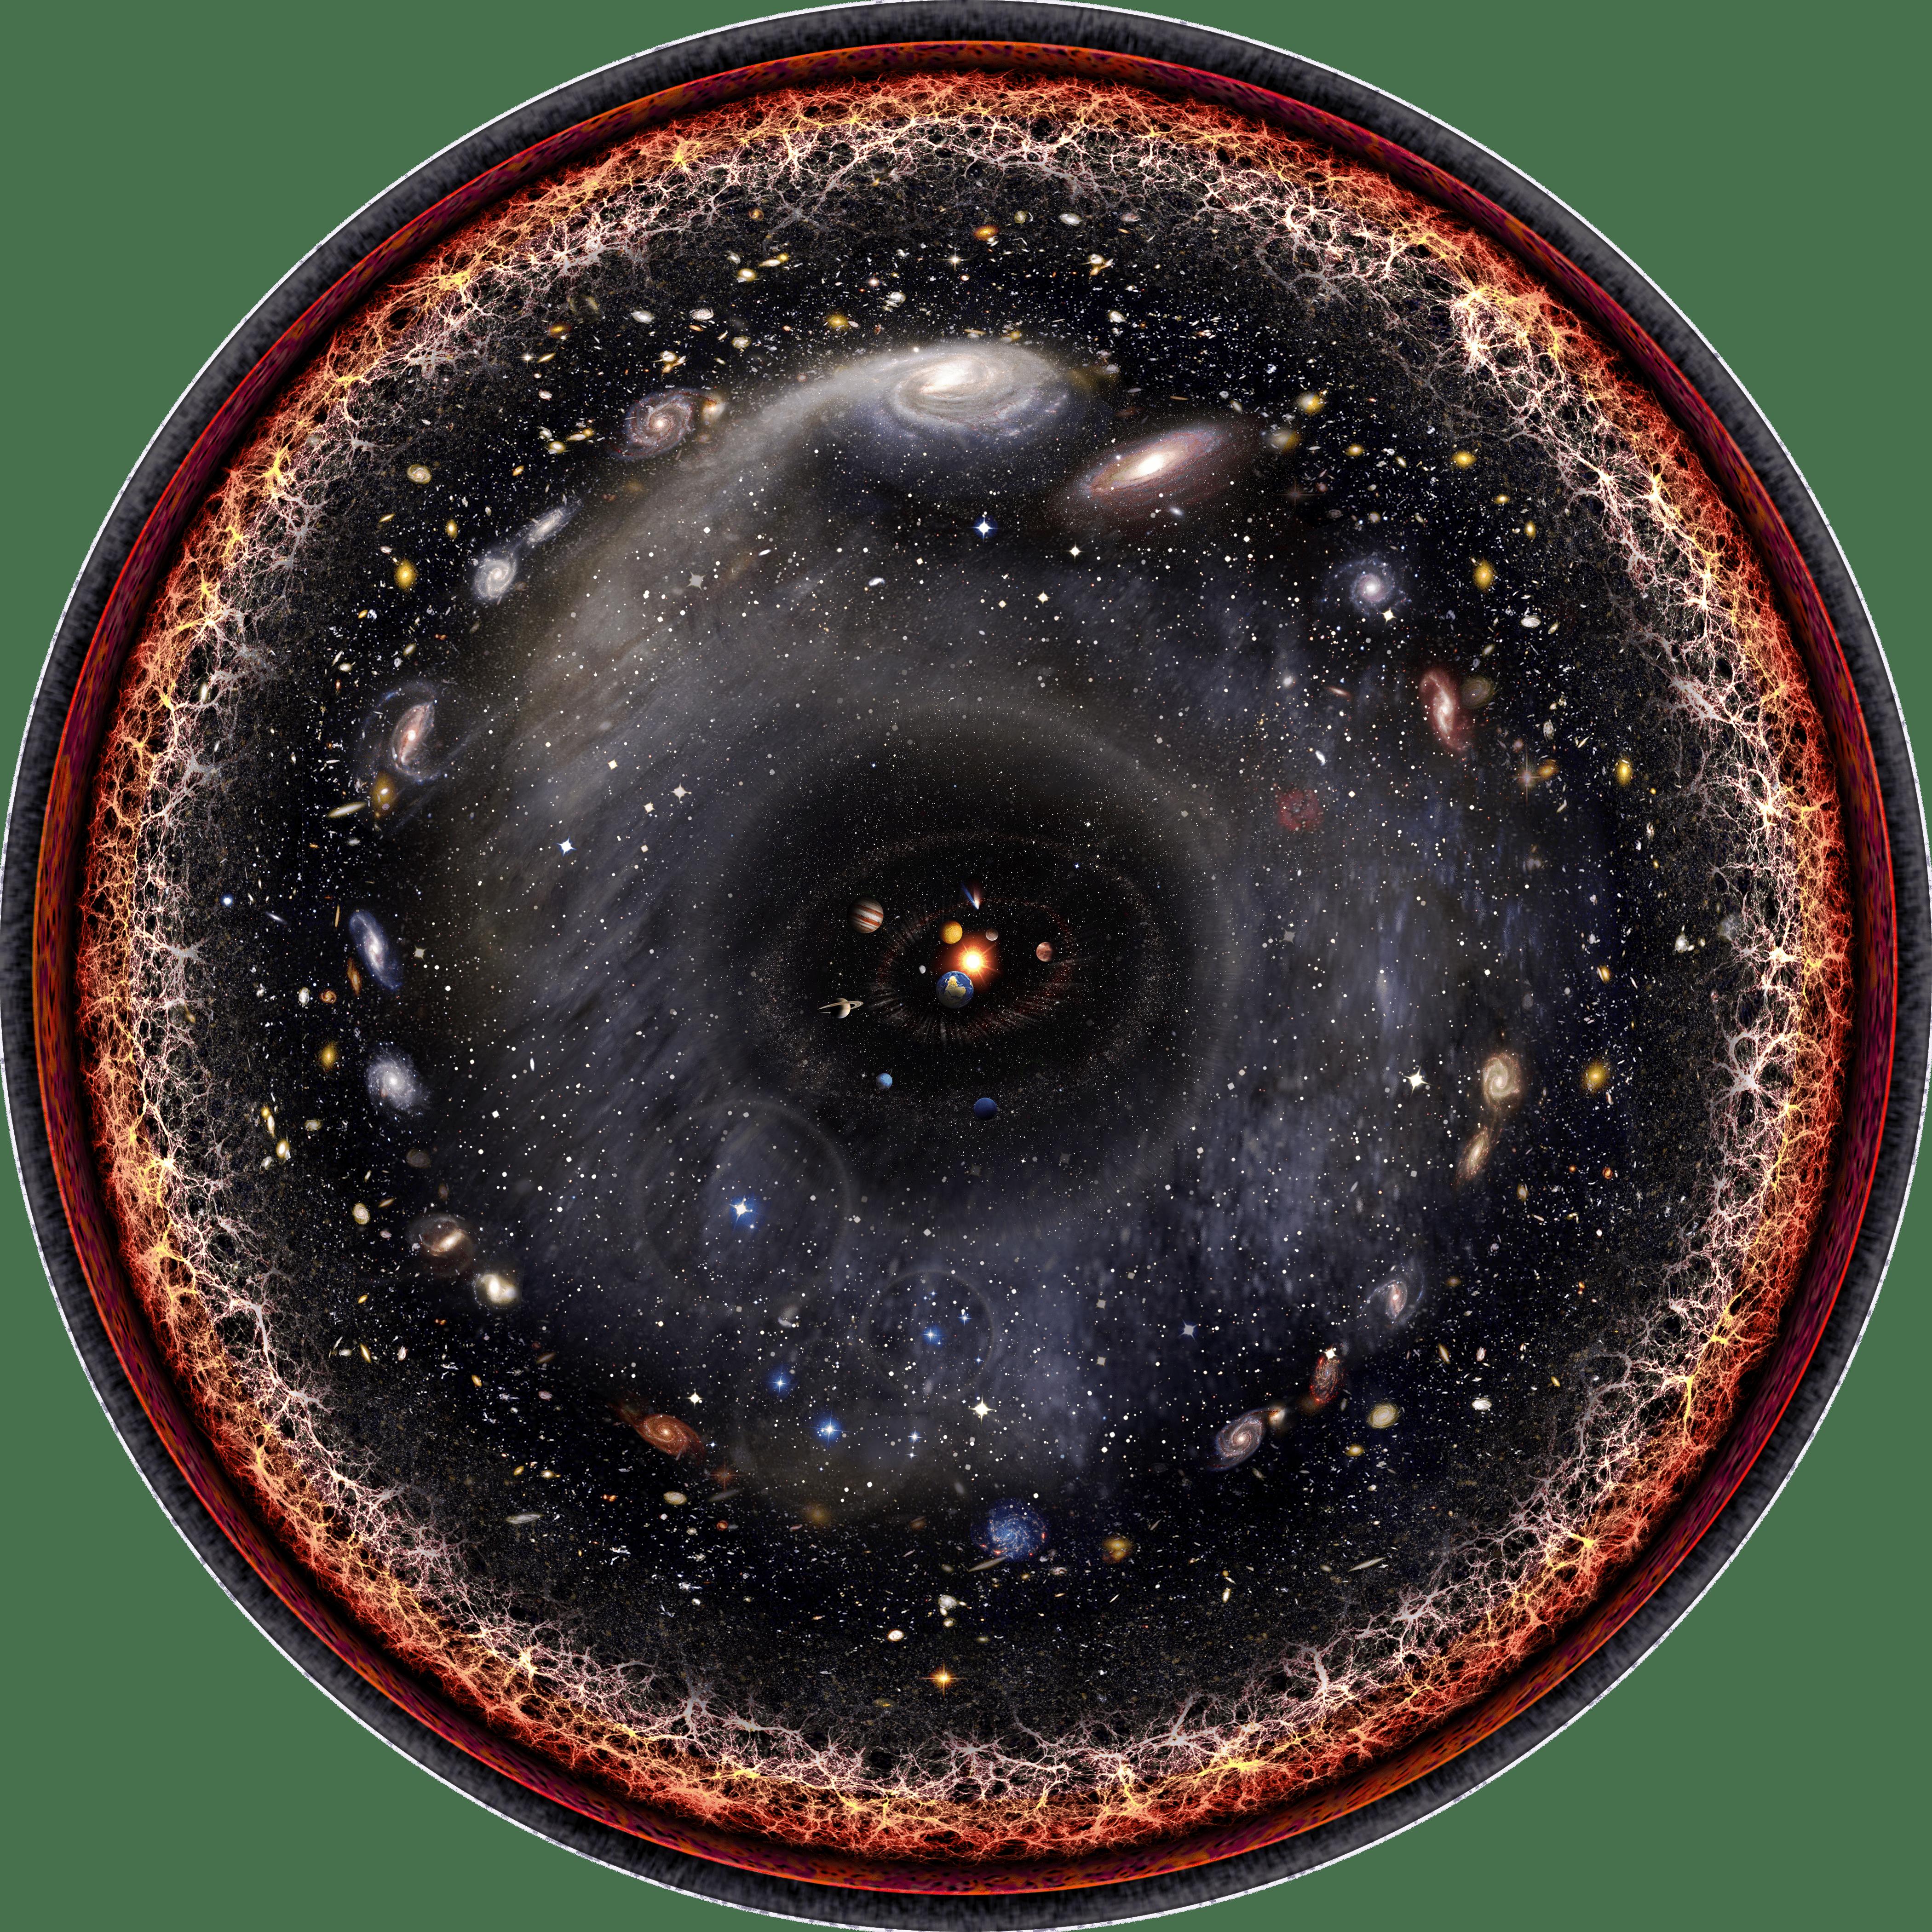 An artist's representation of the finite observable universe. Image Credit: Wikimedia